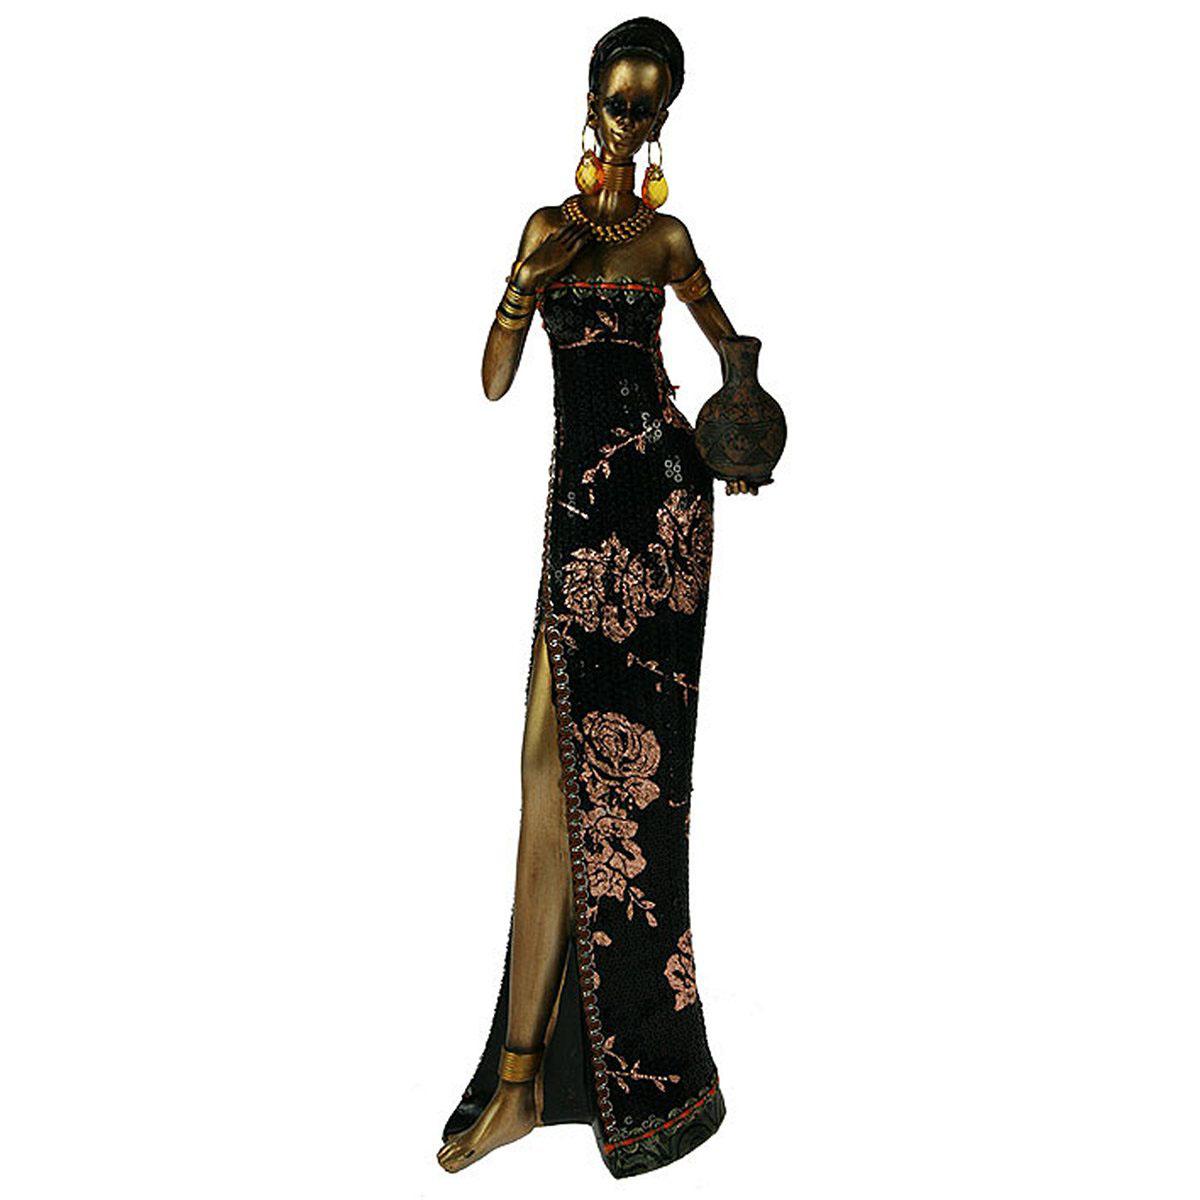 Статуэтка Русские Подарки Африканка, 14 х 8 х 43 см. 26126 статуэтка русские подарки африканка 6 х 11 х 20 см